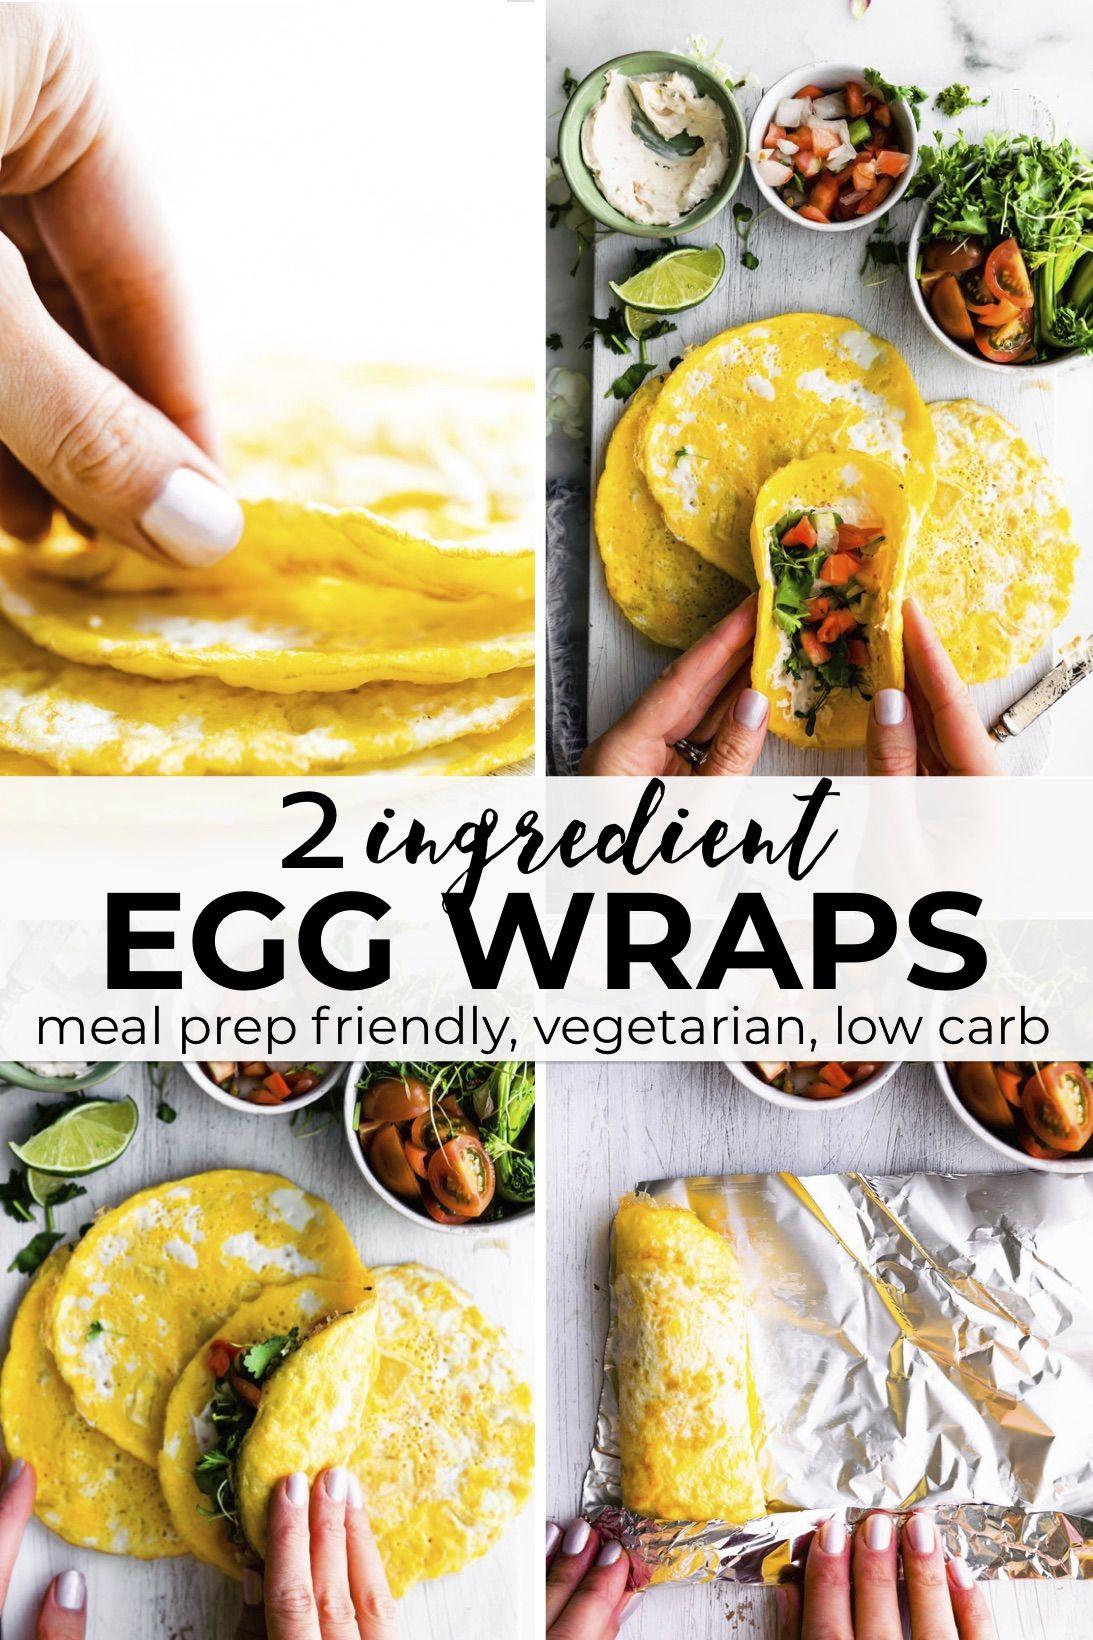 Paleo Breakfast Egg Wraps (Vegetarian Meal Prep Recipe) | Cotter Crunch #eggmeals